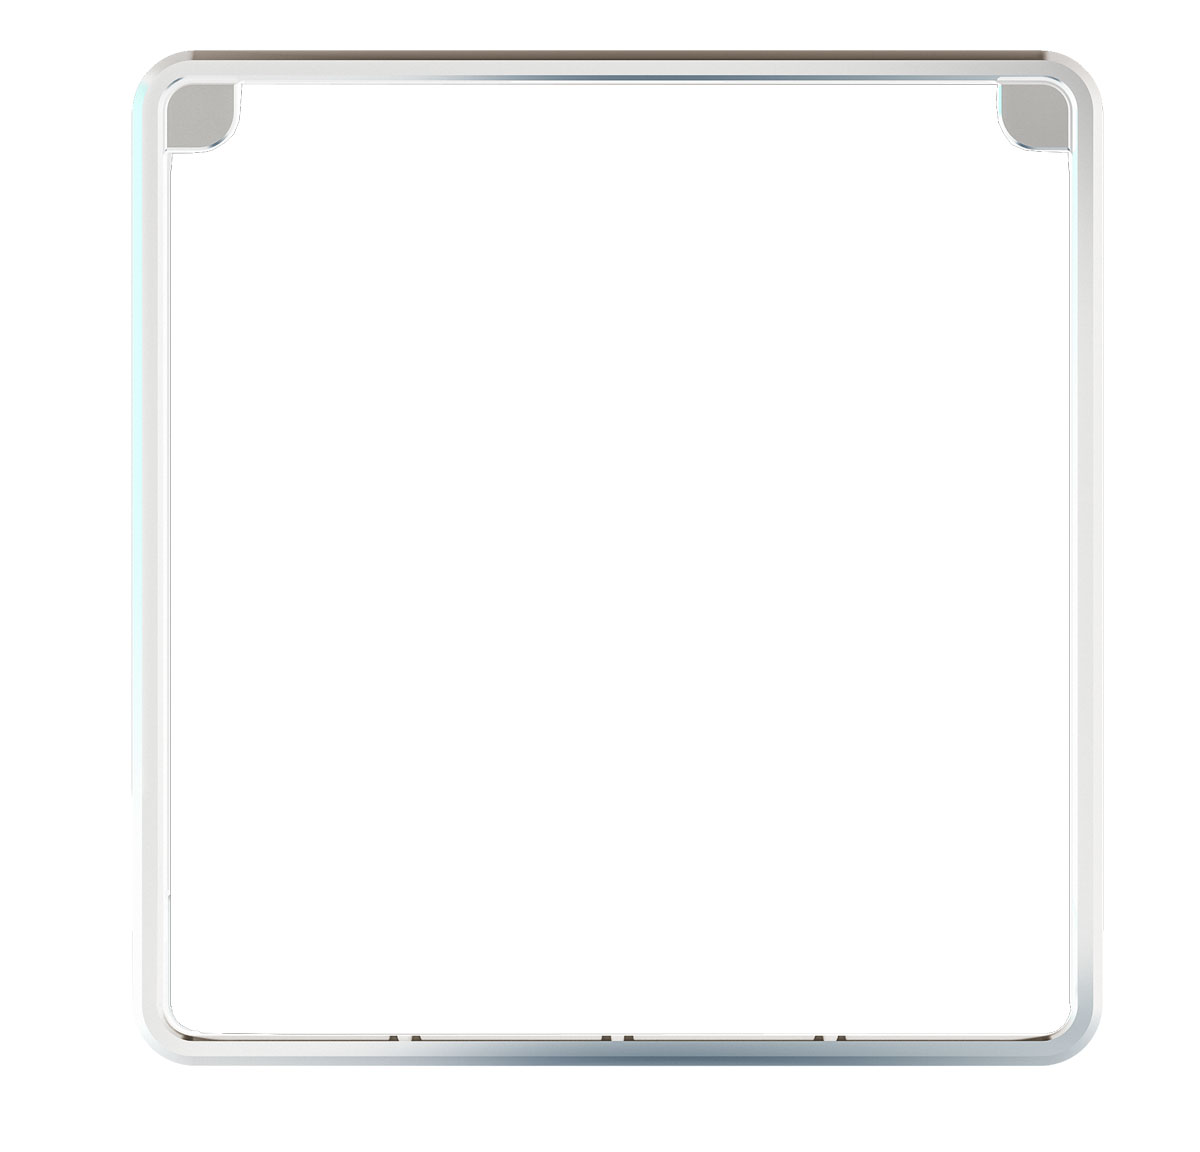 Raymarine 50/i60/i70/p70/p70R Frontrahmen - Silber (eS Serie Design)